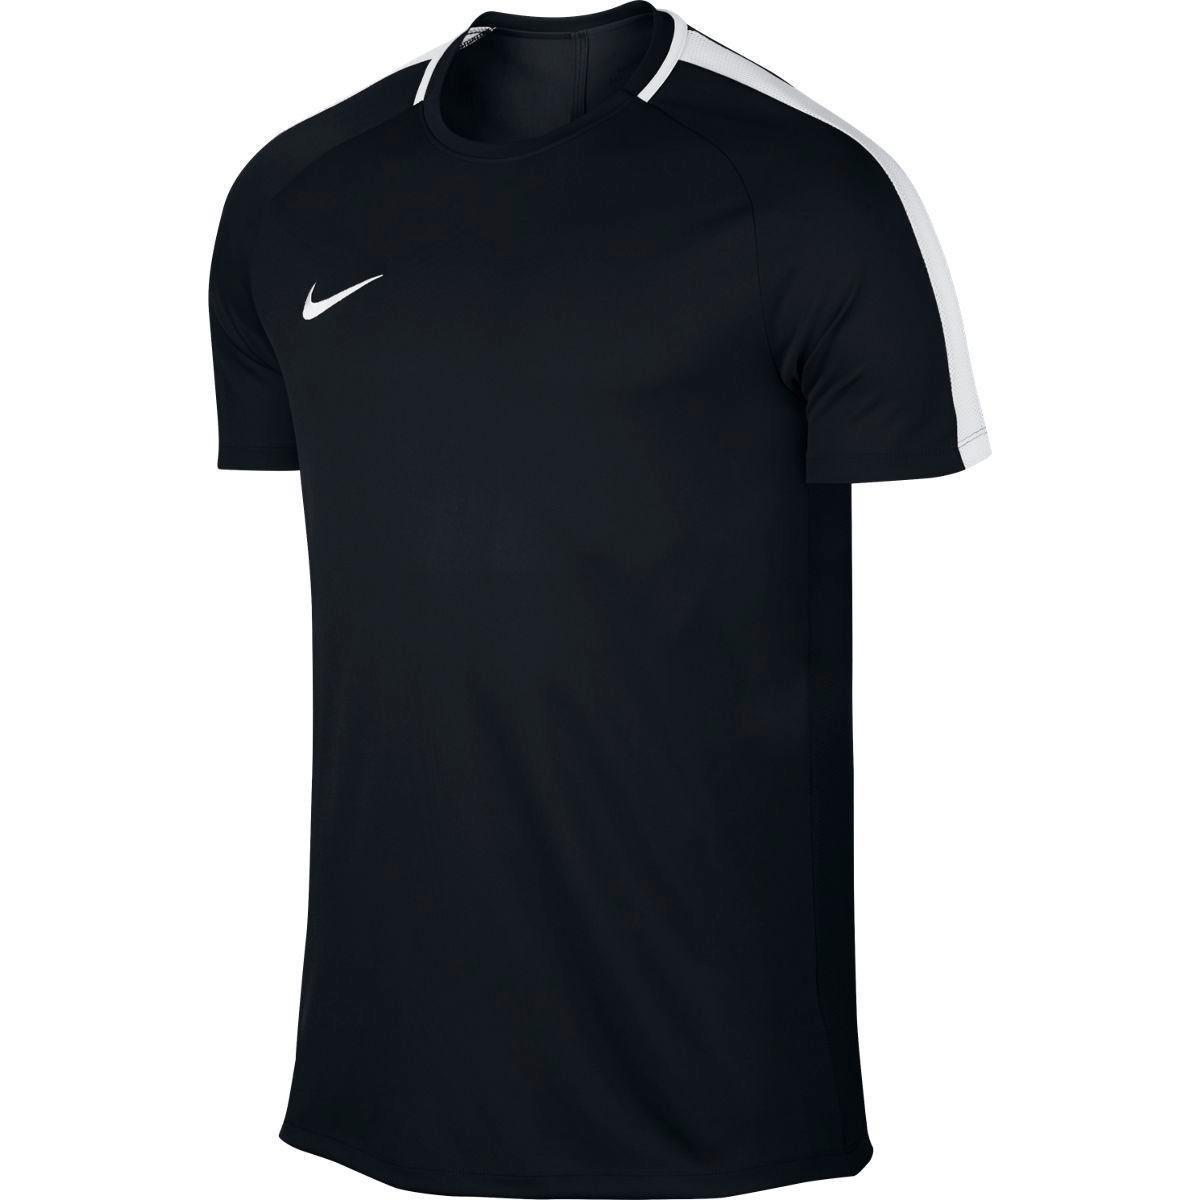 f030444c8779f Camisa Nike Academy Masculina - Preto e Branco - Compre Agora